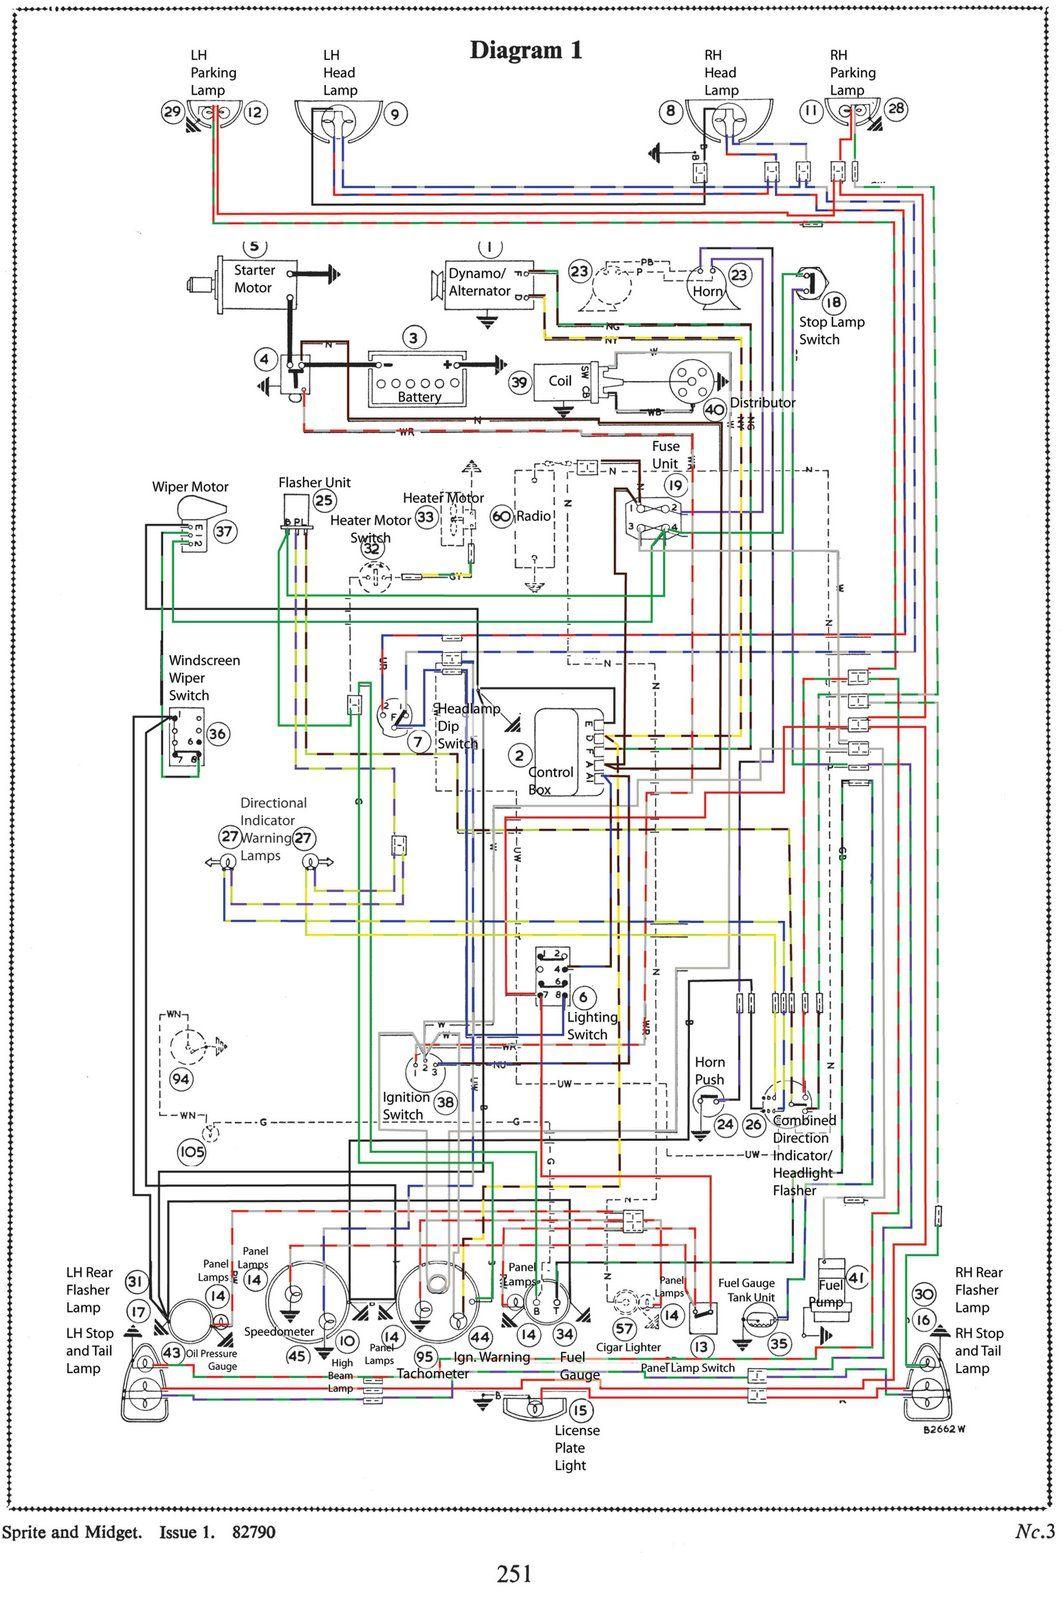 mk3 sprite wiring diagram austin healey sprite mg. Black Bedroom Furniture Sets. Home Design Ideas